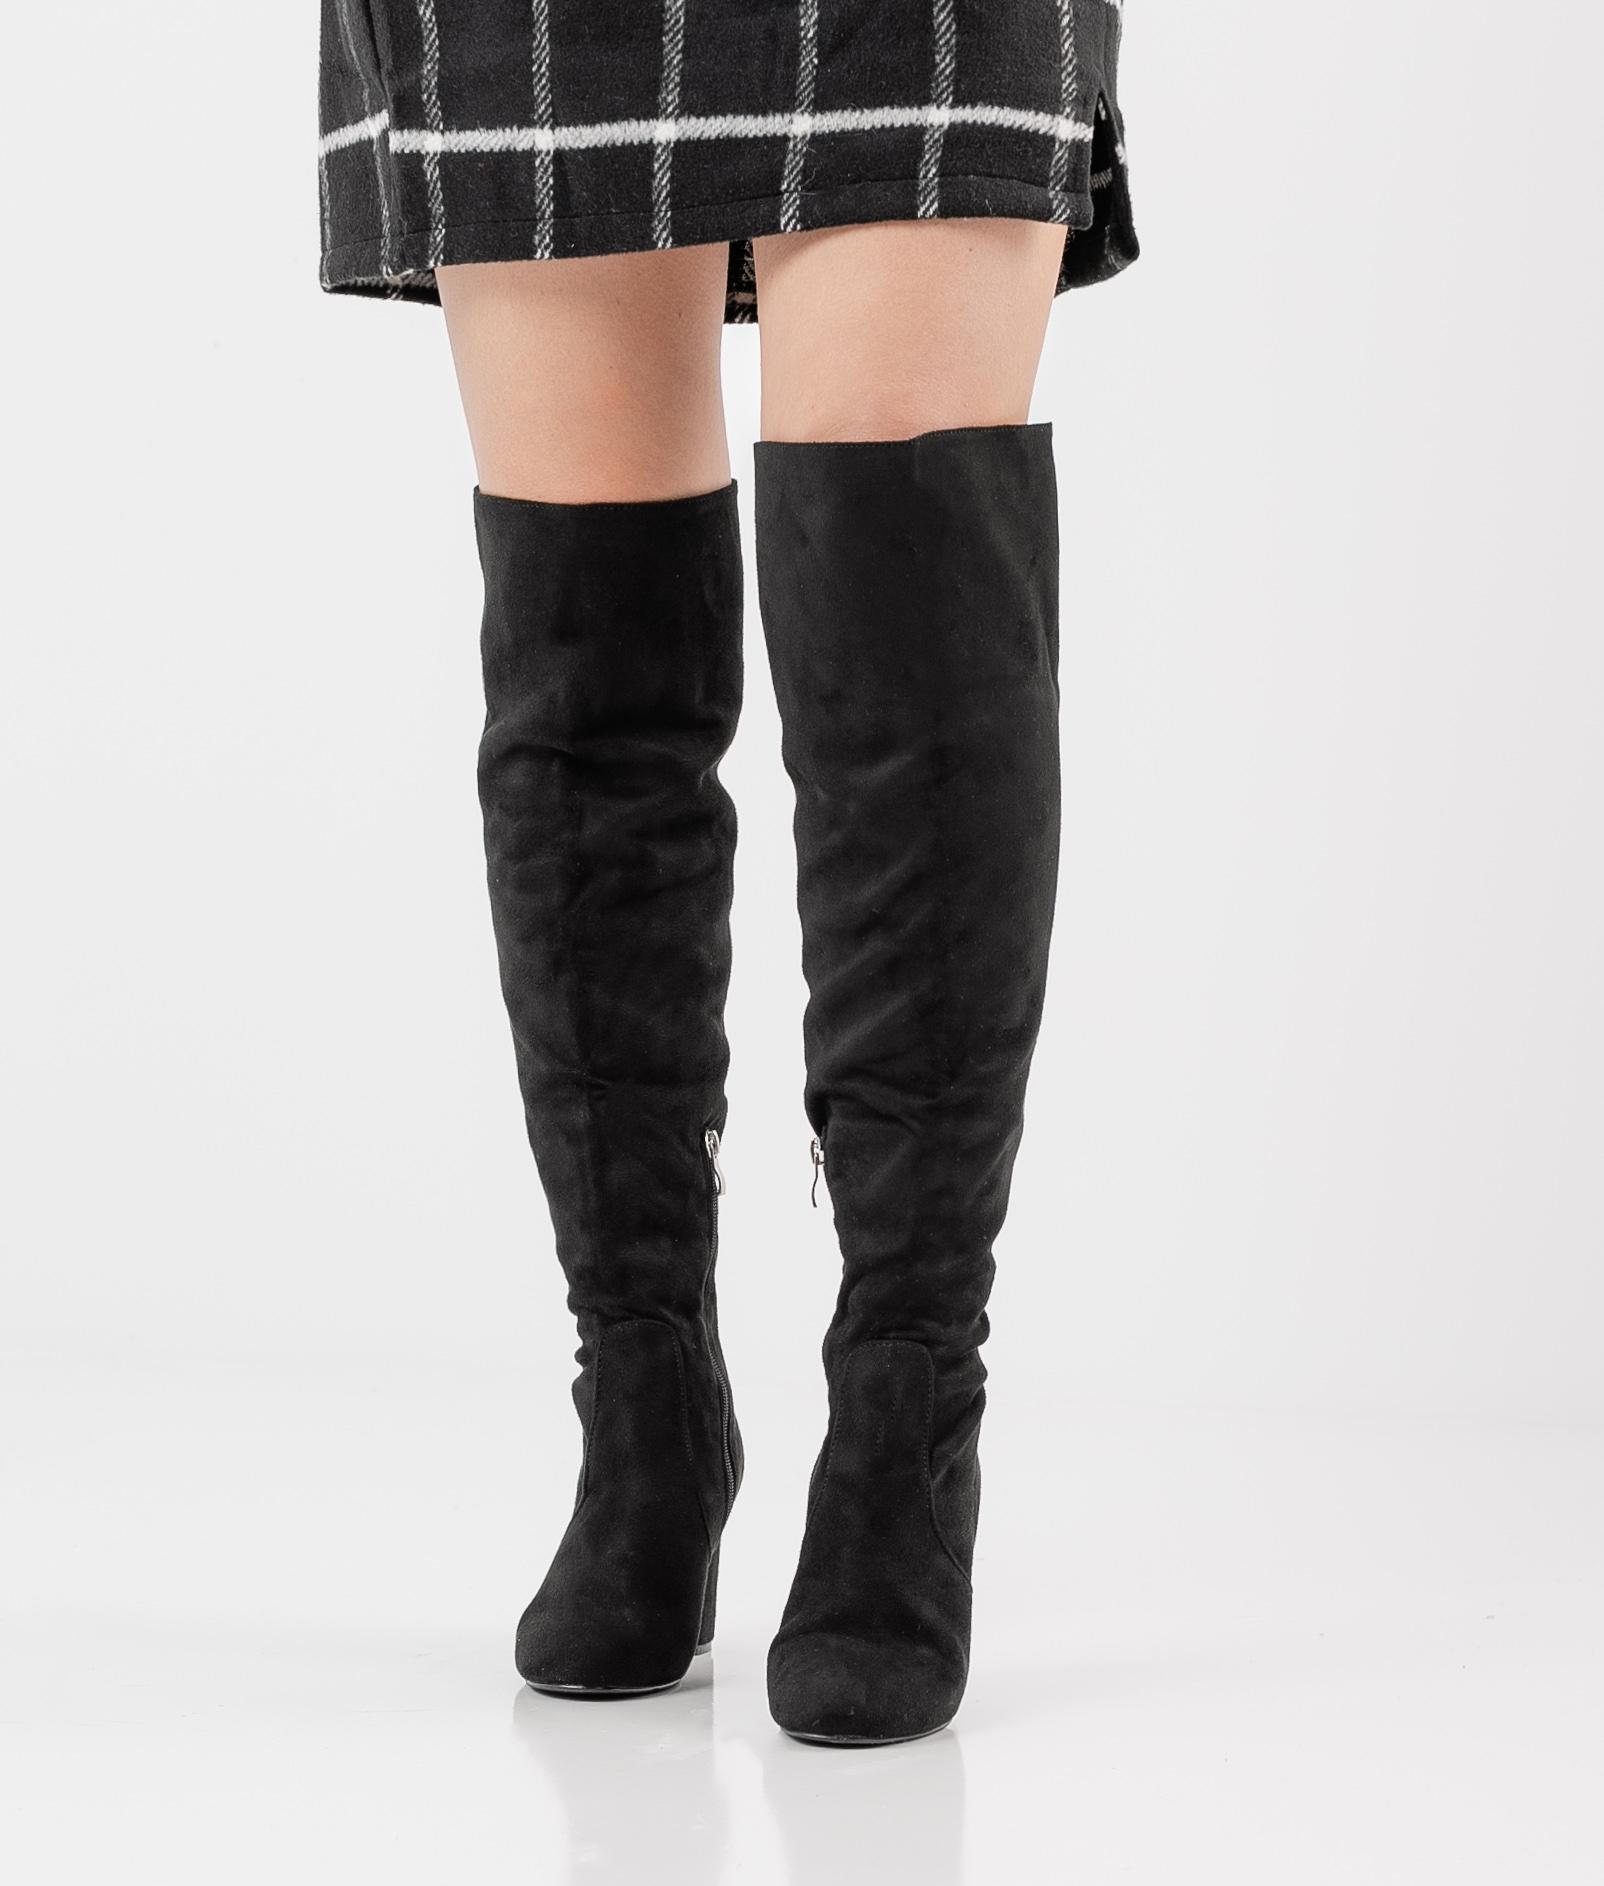 Knee-Lenght Boot Glea - Black